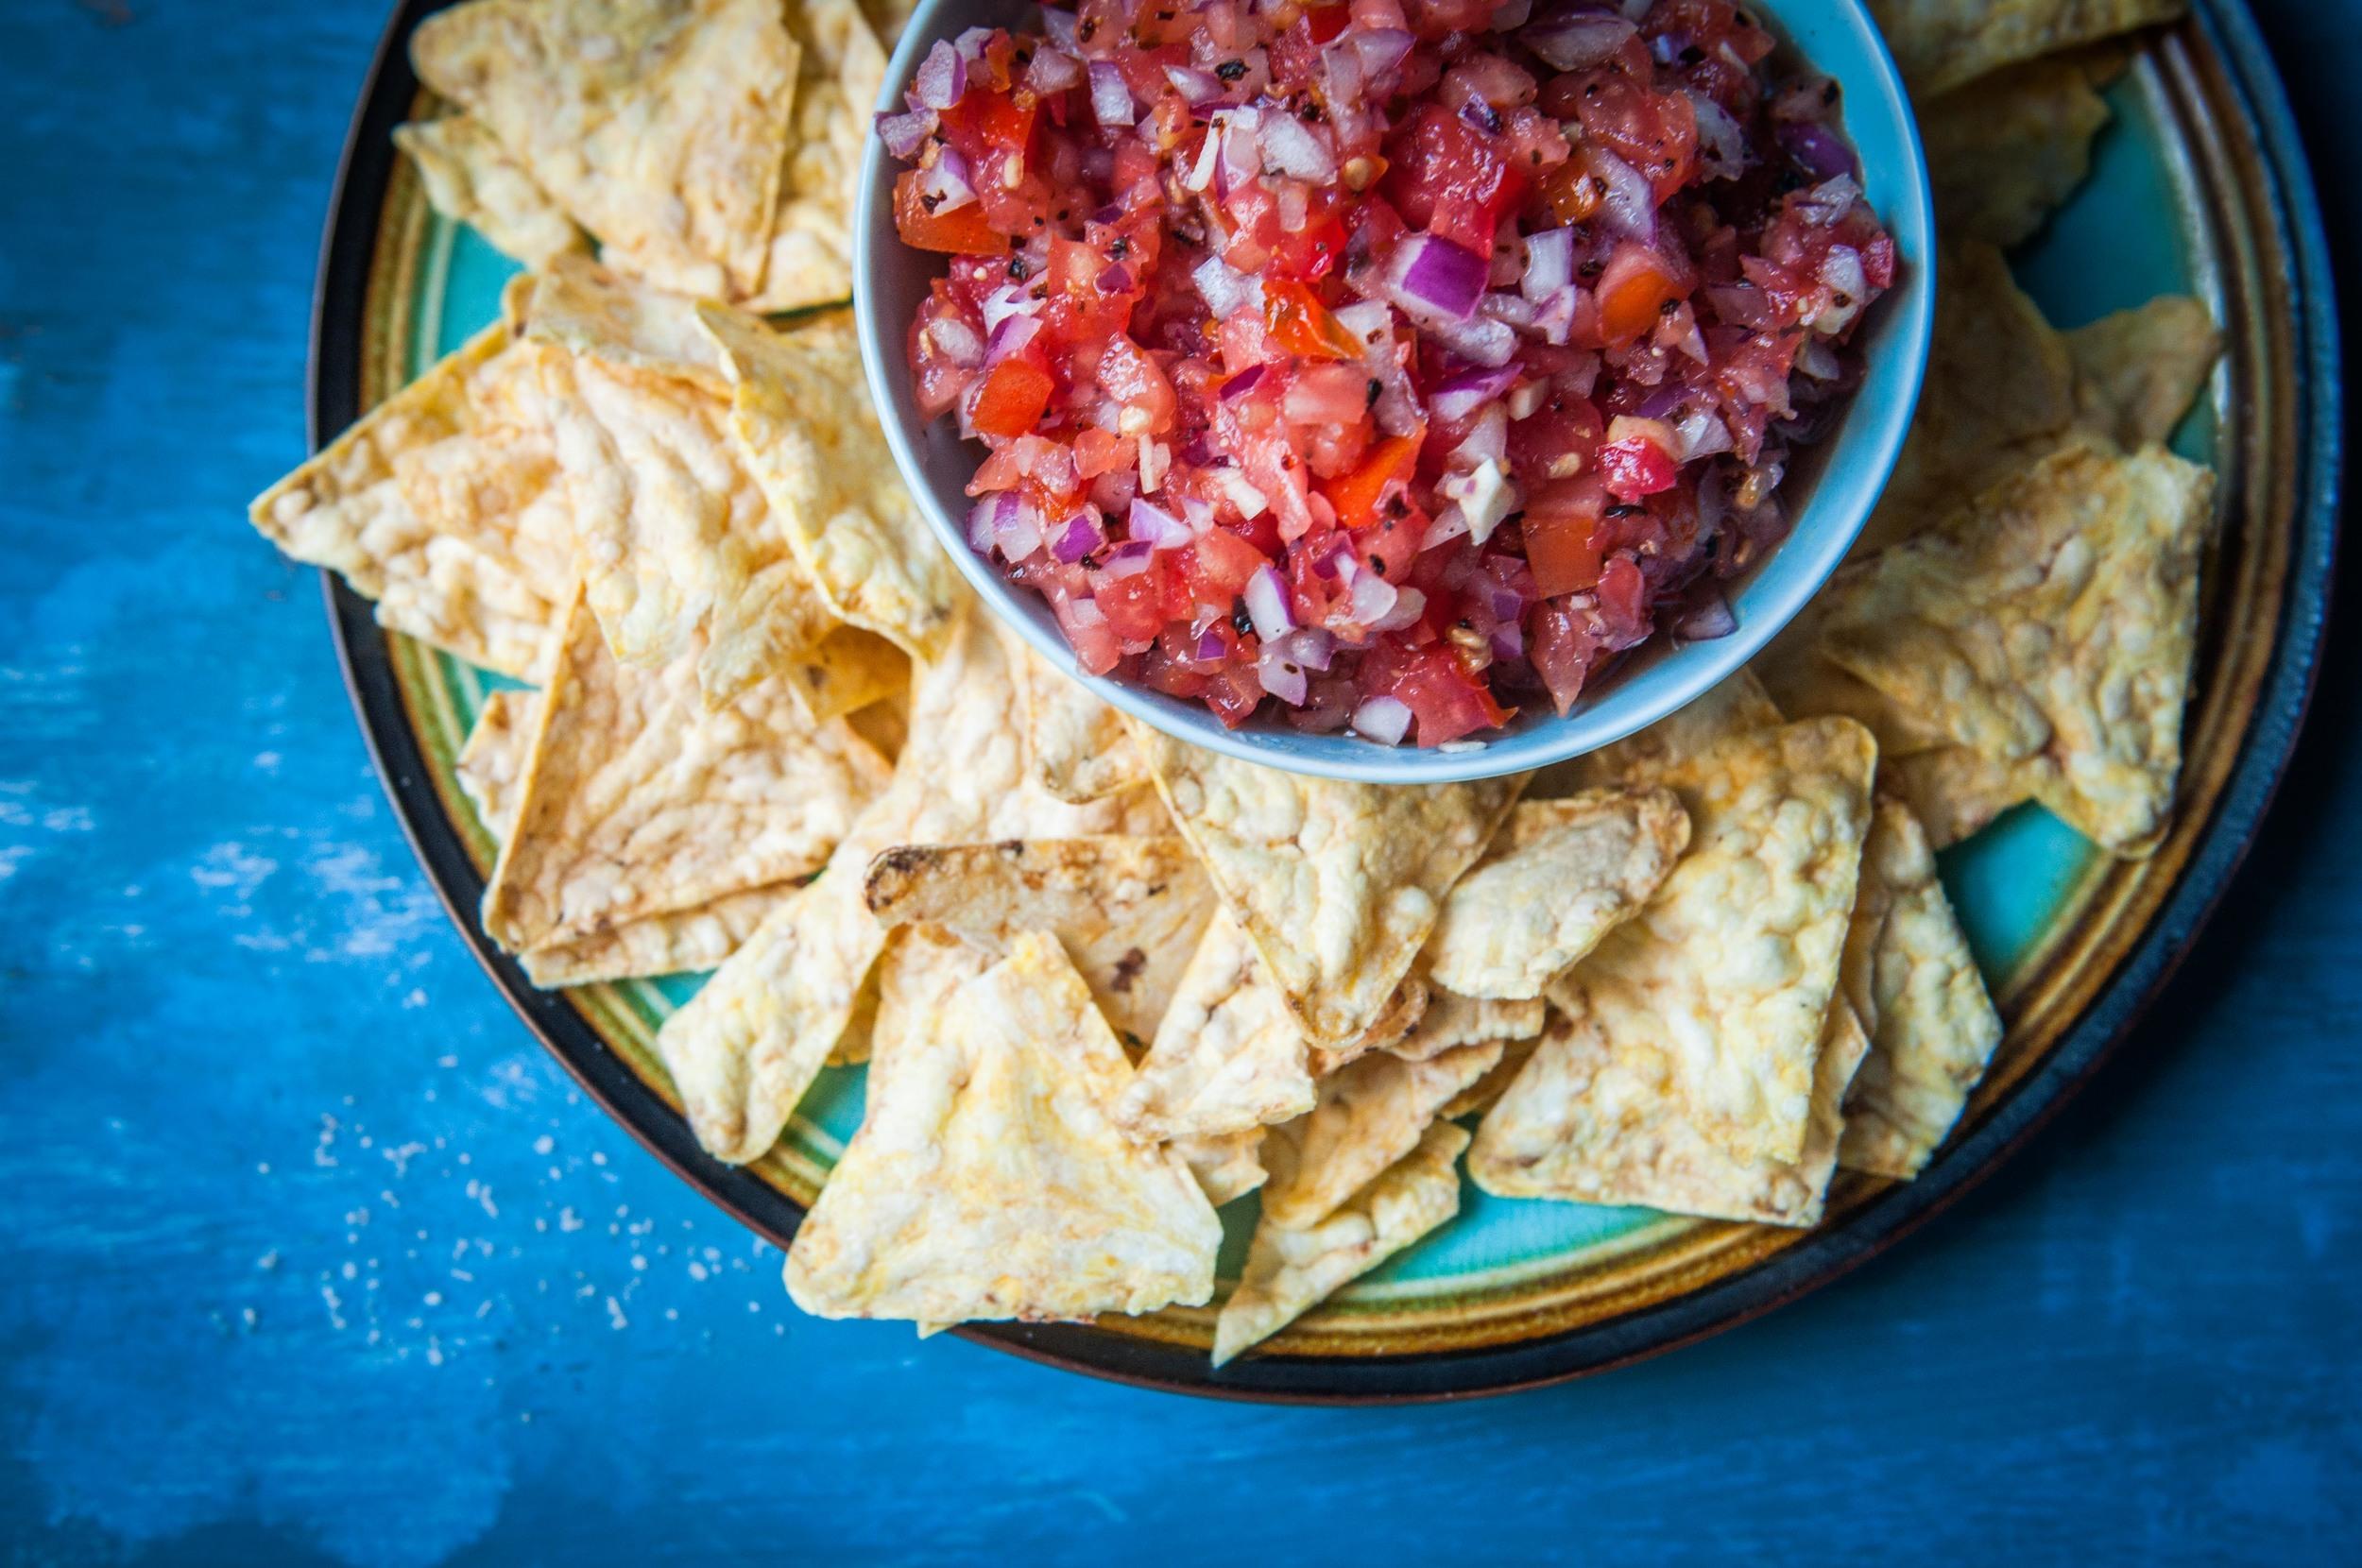 Fresh Smoky Honey Chipotle Salsa - Fork Spoon Knife